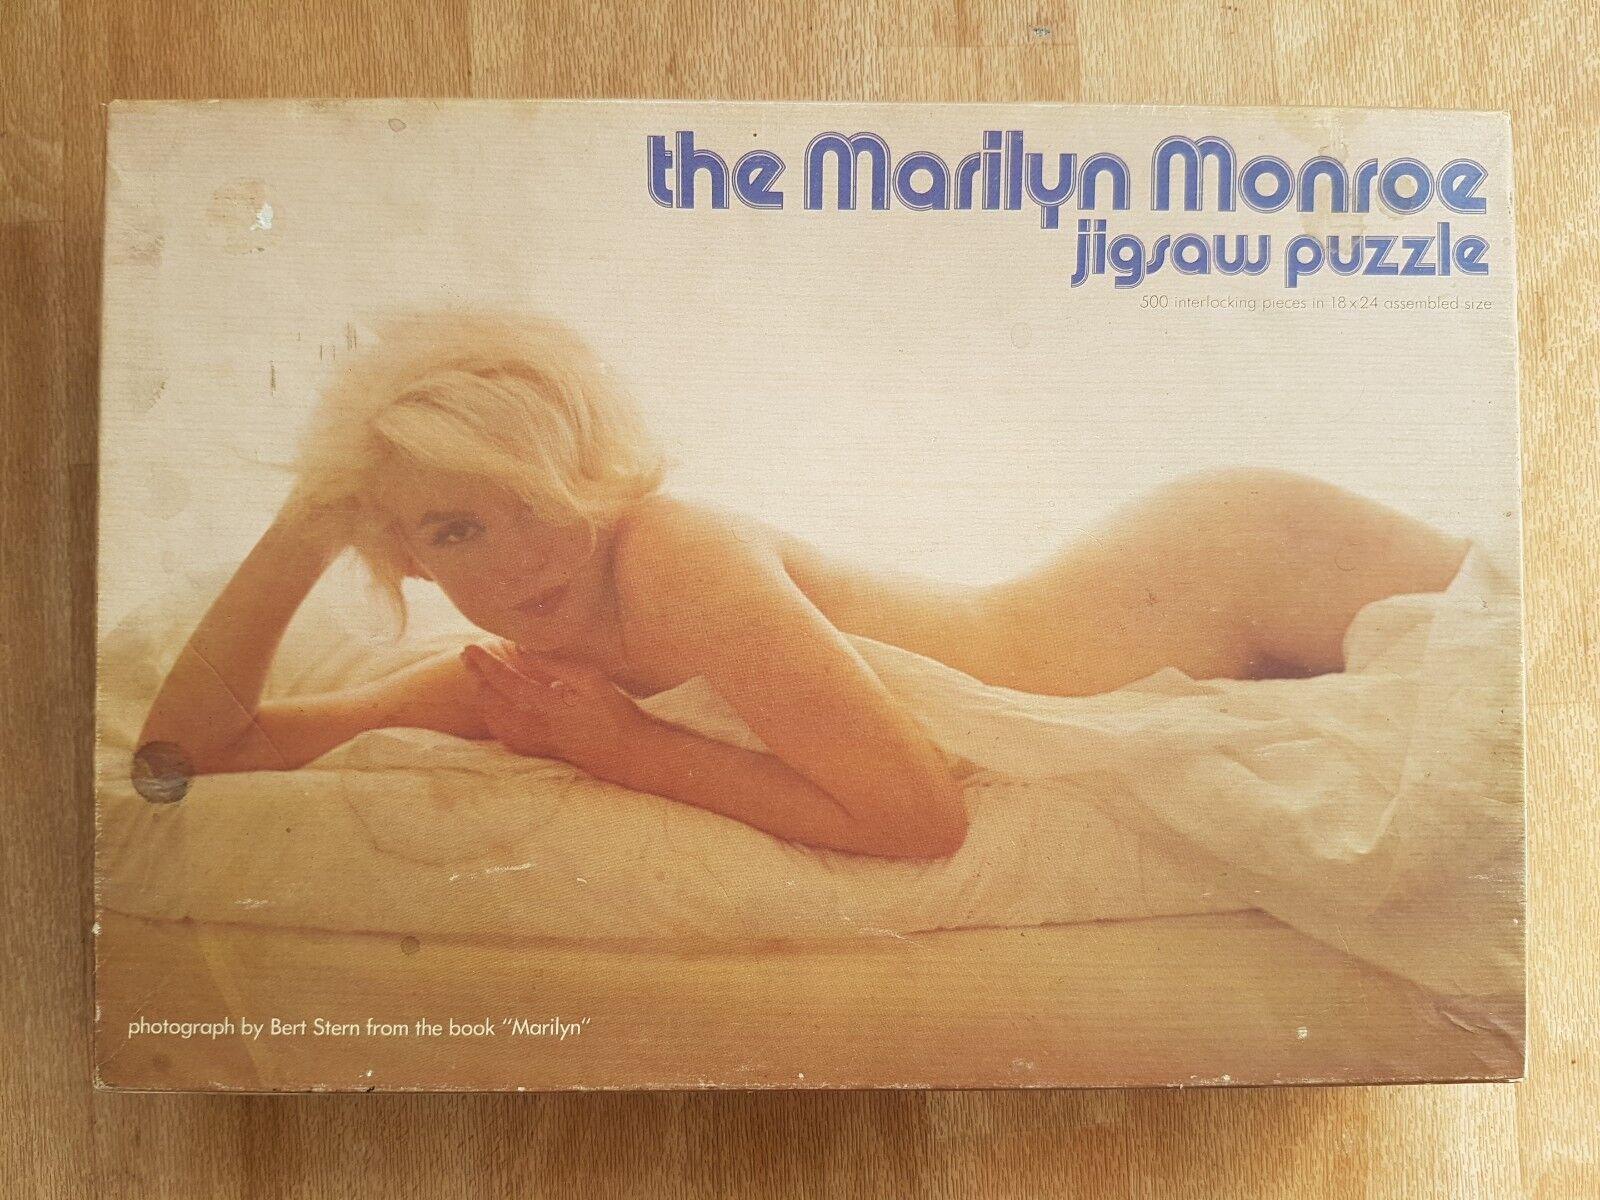 MARILYN MONROE JIGSAW PUZZLE VINTAGE RETRO RARE TOY GAME